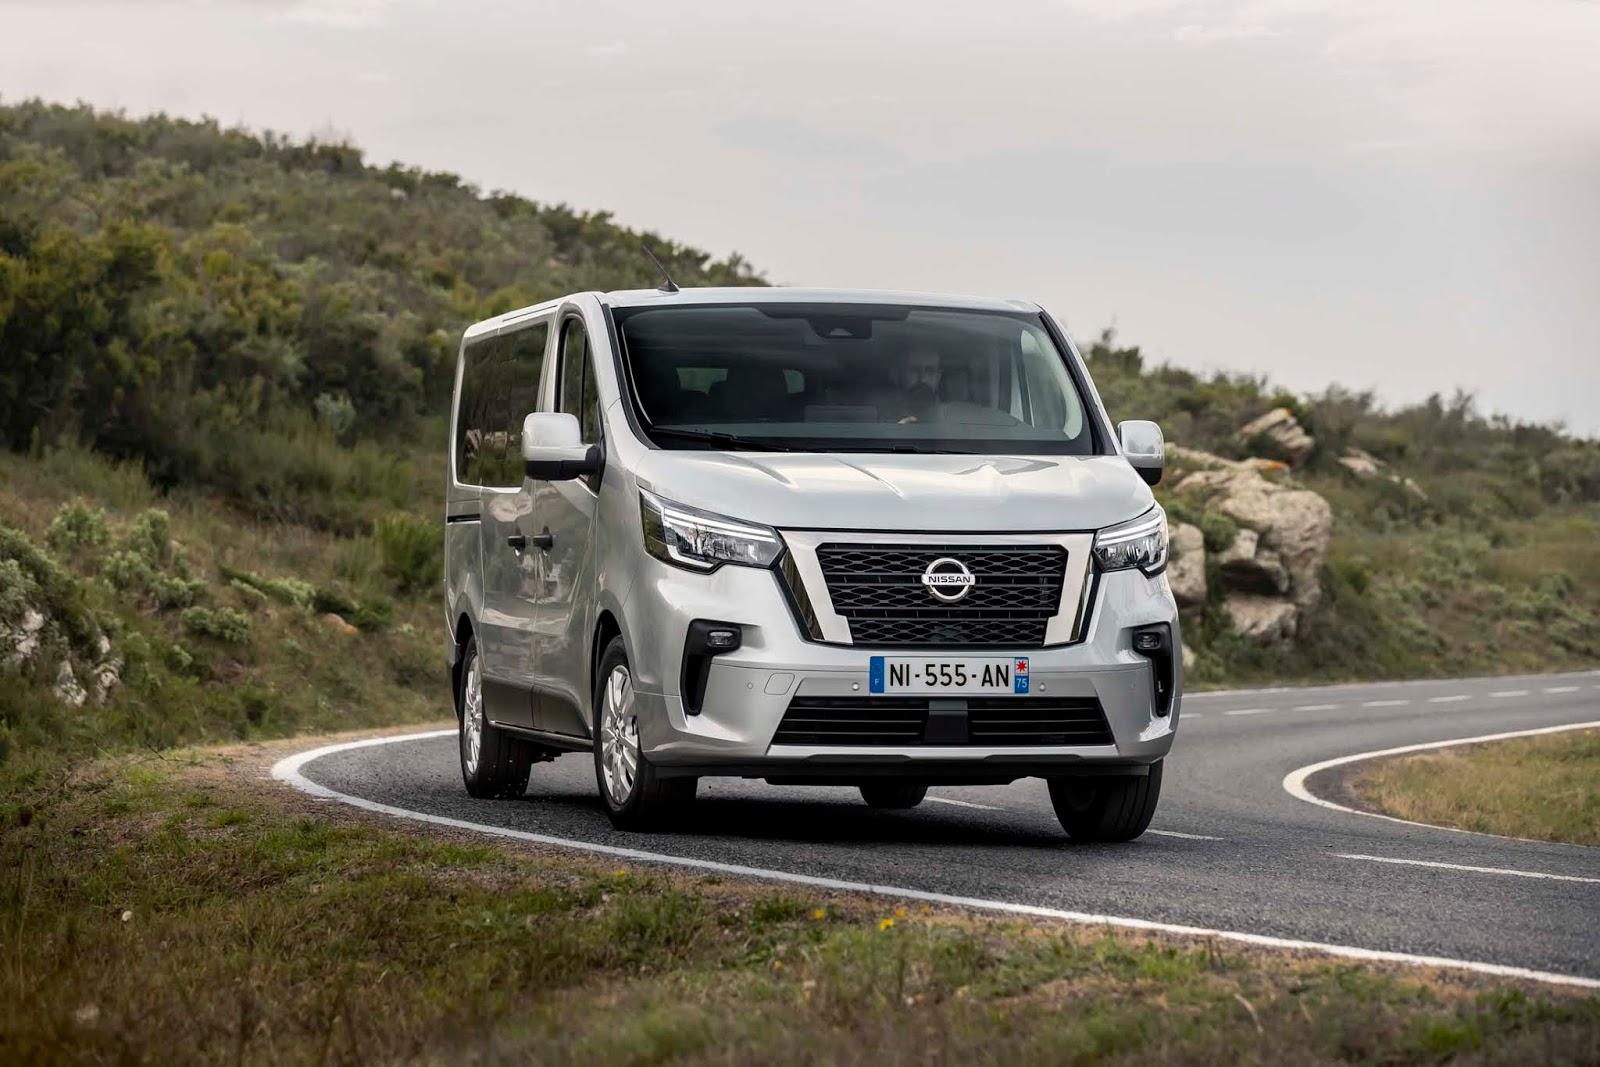 New2BNV3002BCombi2BDynamic2B2 Nissan : Αισθητικές αναβαθμίσεις, βελτιωμένο κινητήριο σύνολο και νέες τεχνολογίες ασφαλείας για το NV300 Combi (& video)